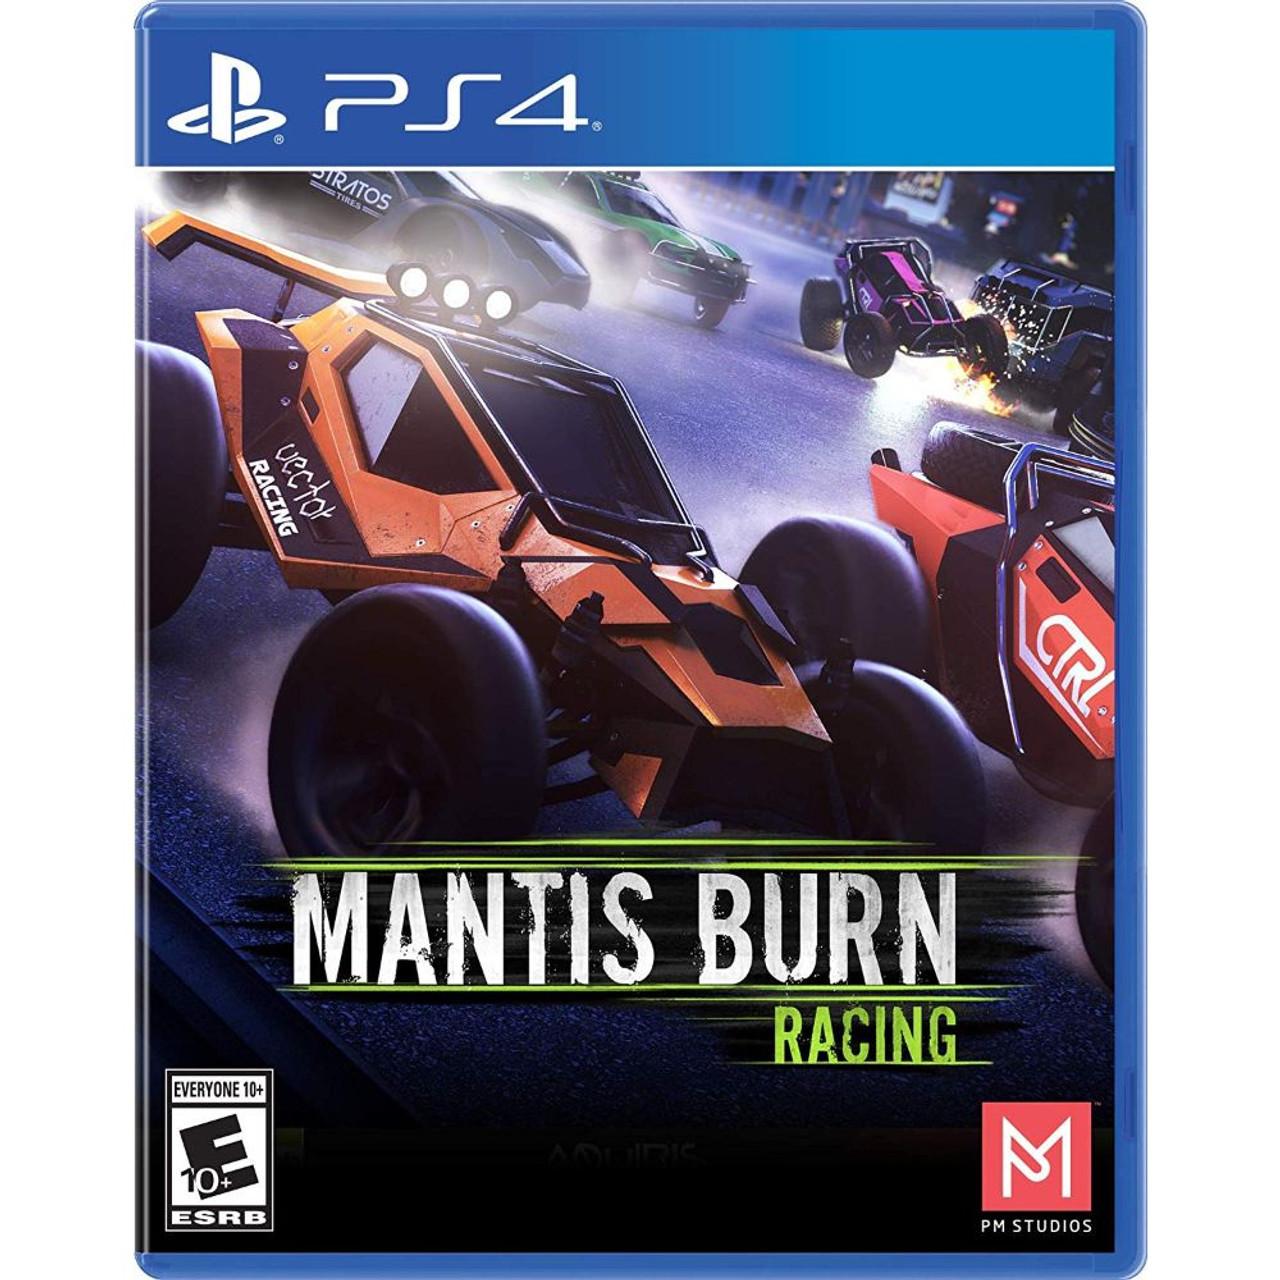 Mantis Burn Racing PS4 [PRE-ORDER] - Vast Inc